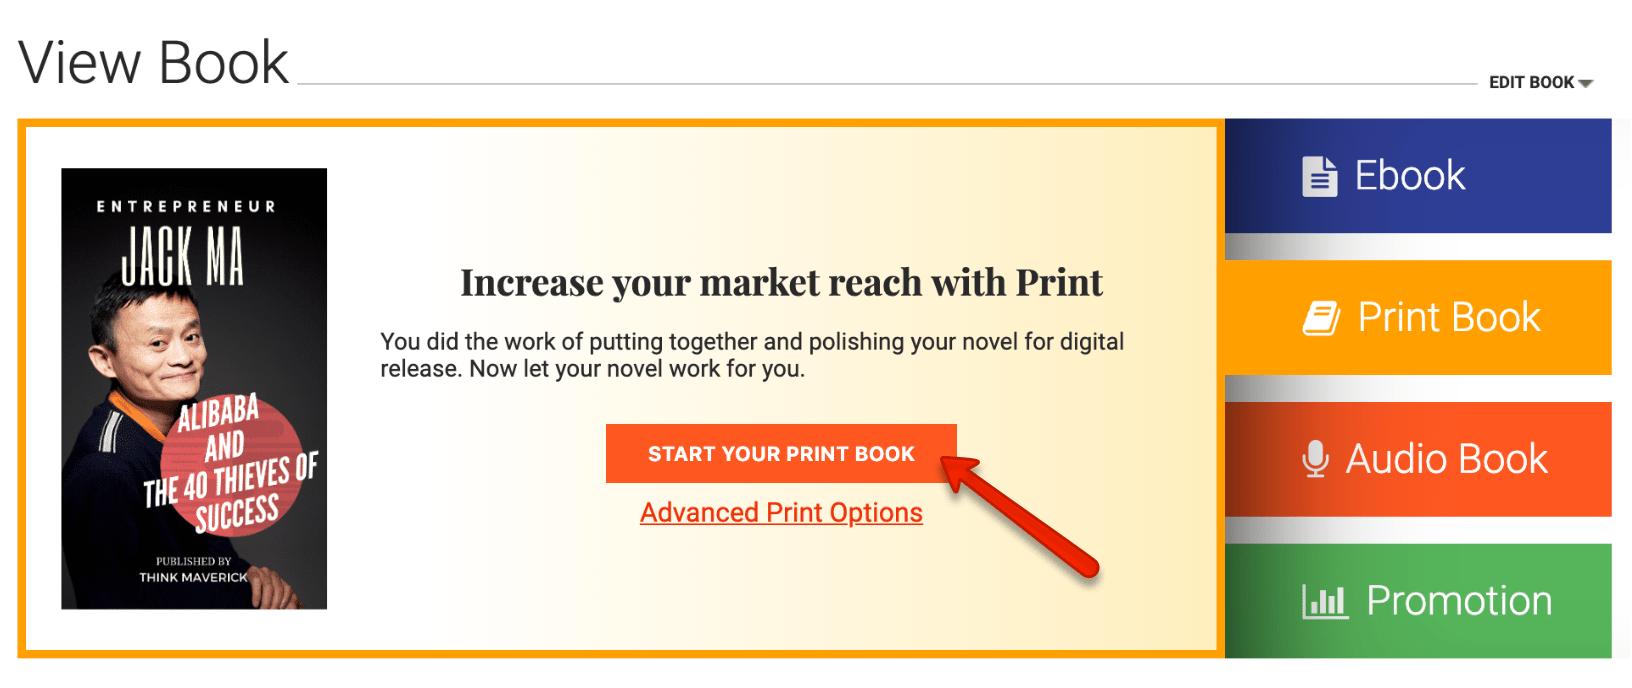 Self Publishing: Pros and Cons of Draft2Digital. Thinkmaverick